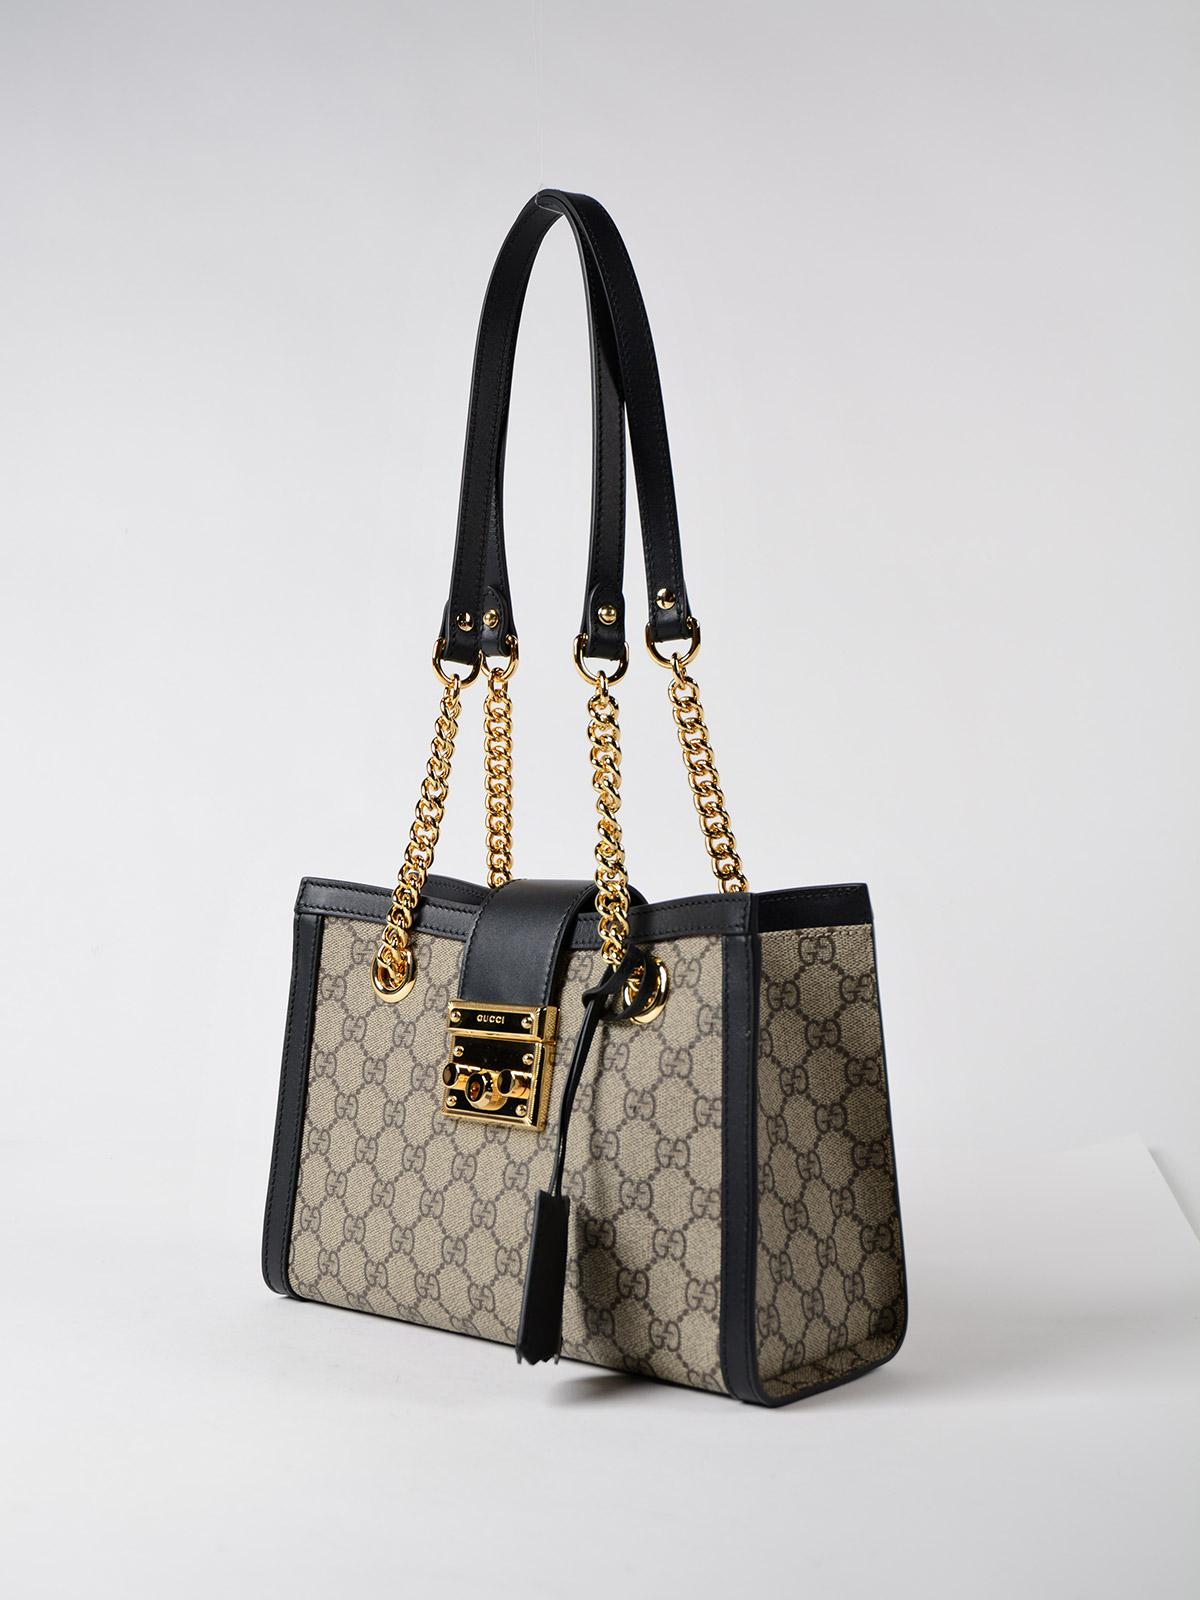 81c15092f9a Lyst - Gucci Gg Supreme Padlock Bag in Black